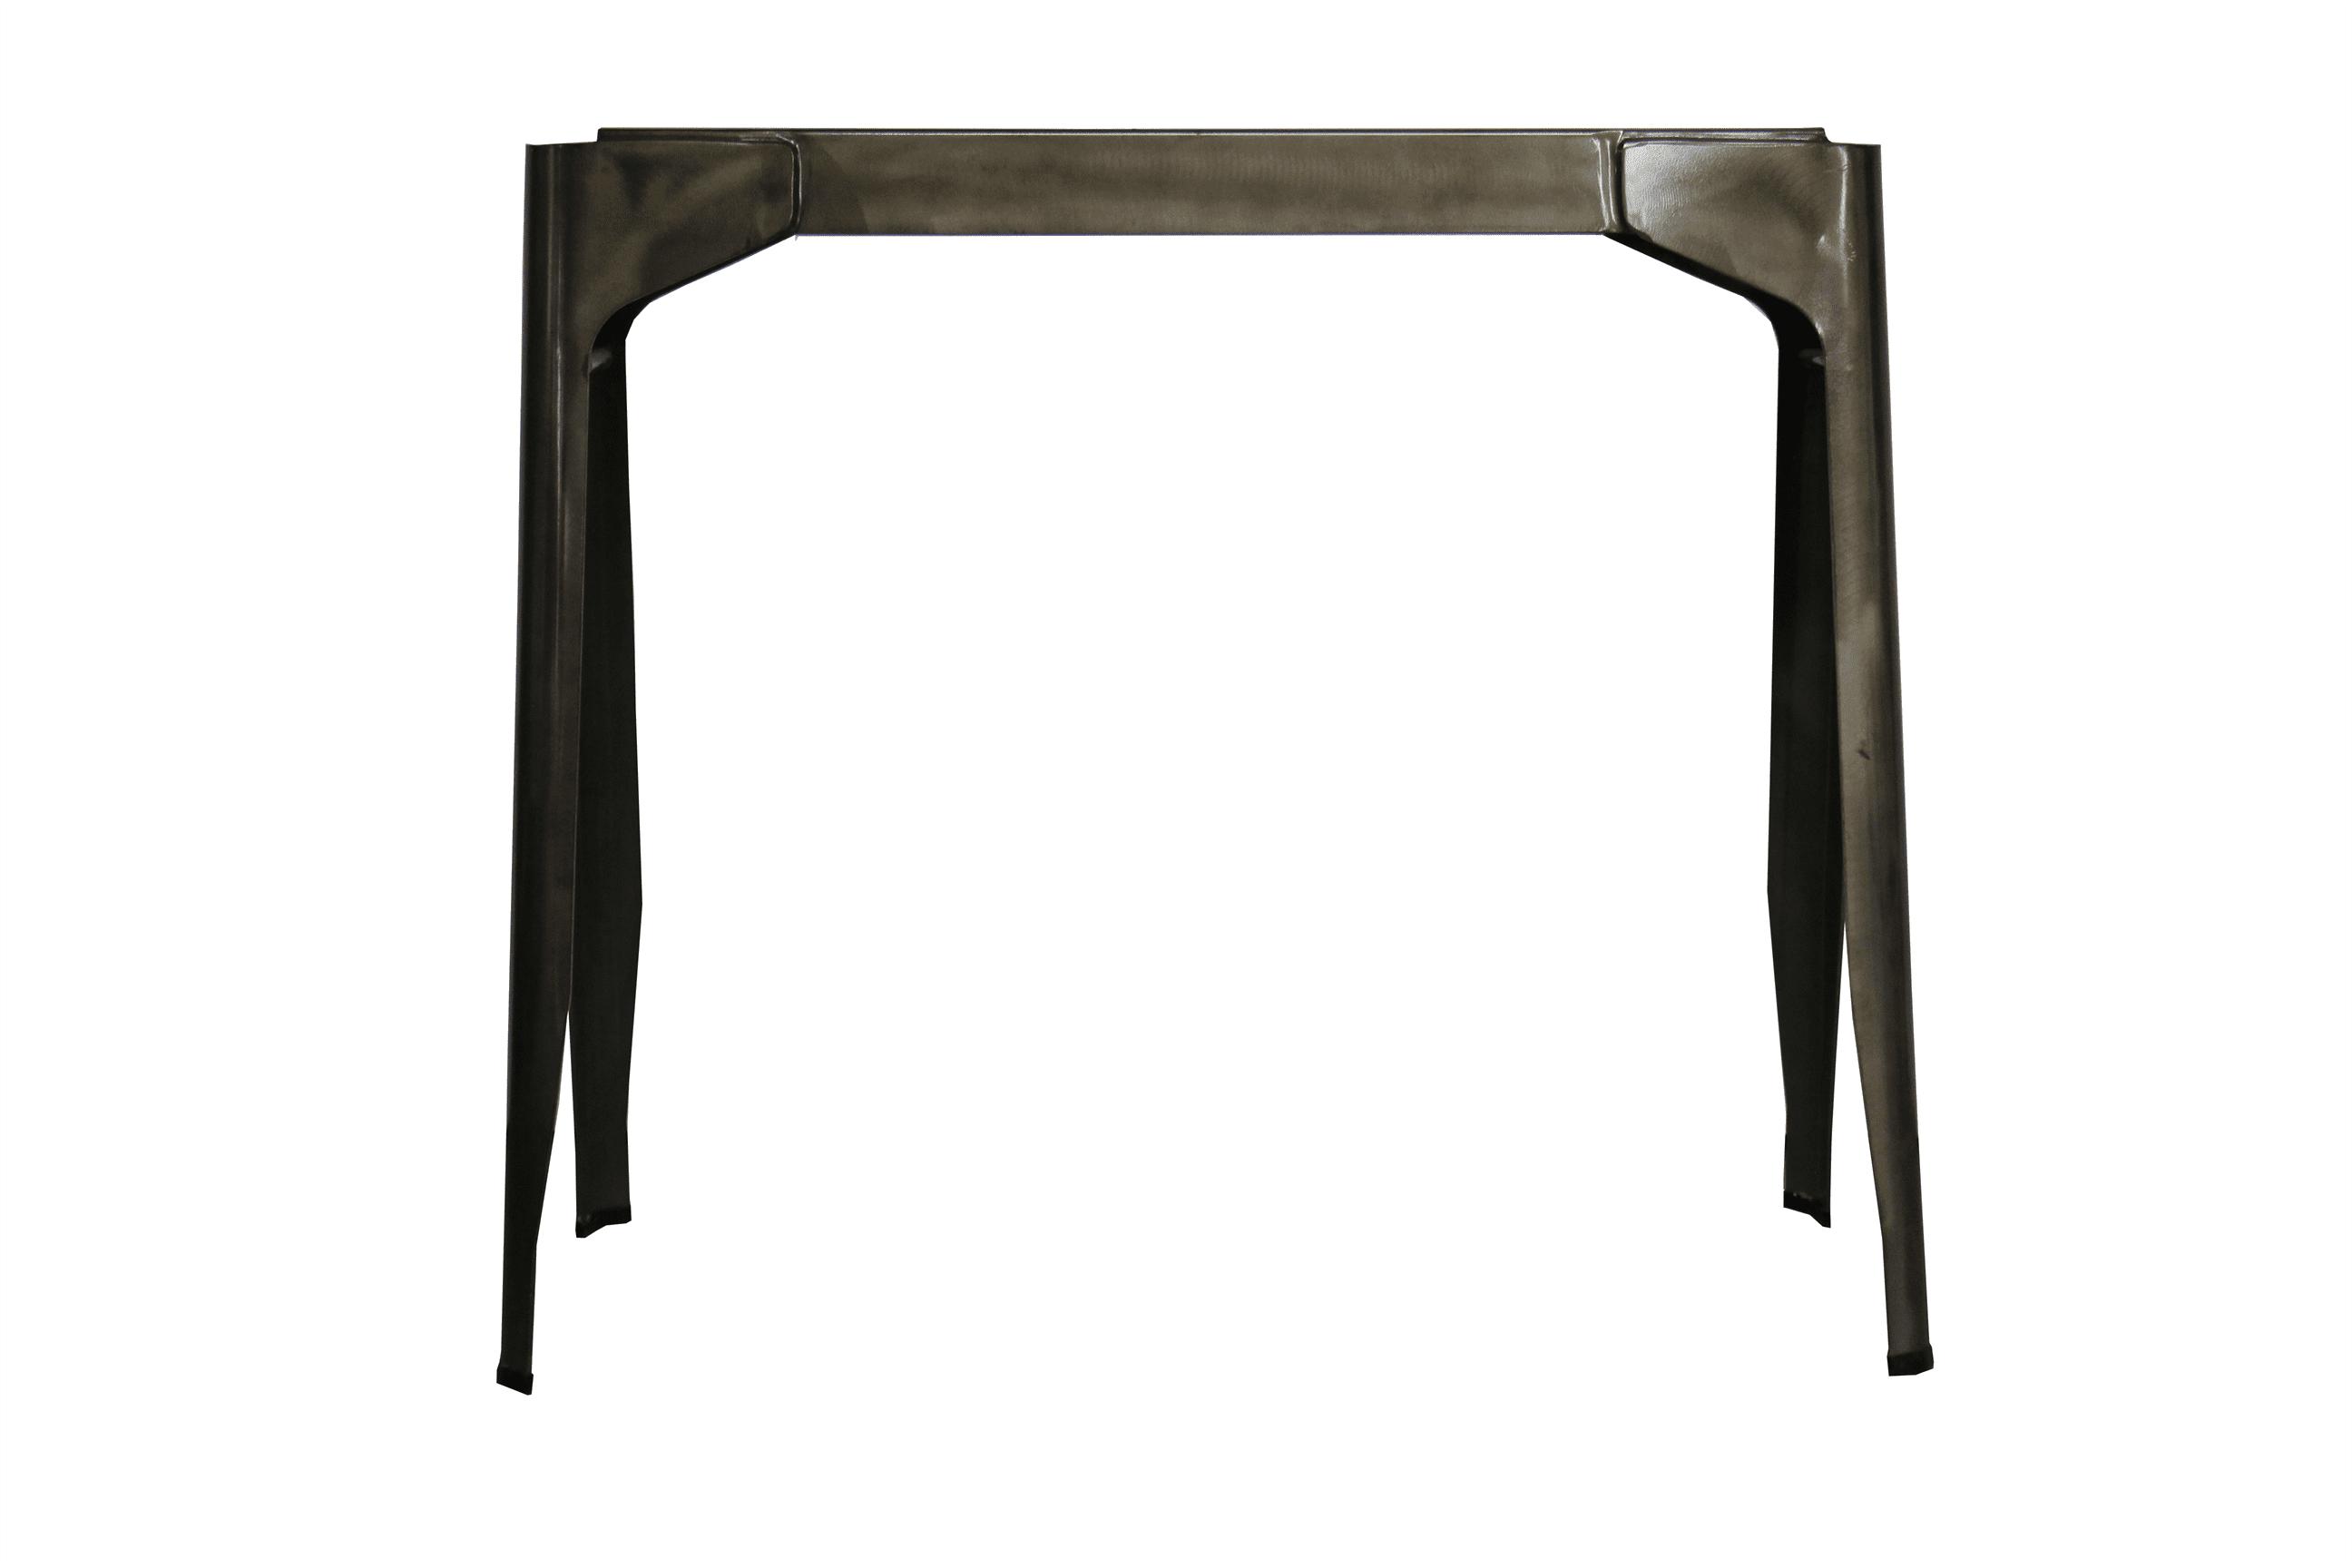 RELISH TRESTLE DBLE TABLE BASE STEEL